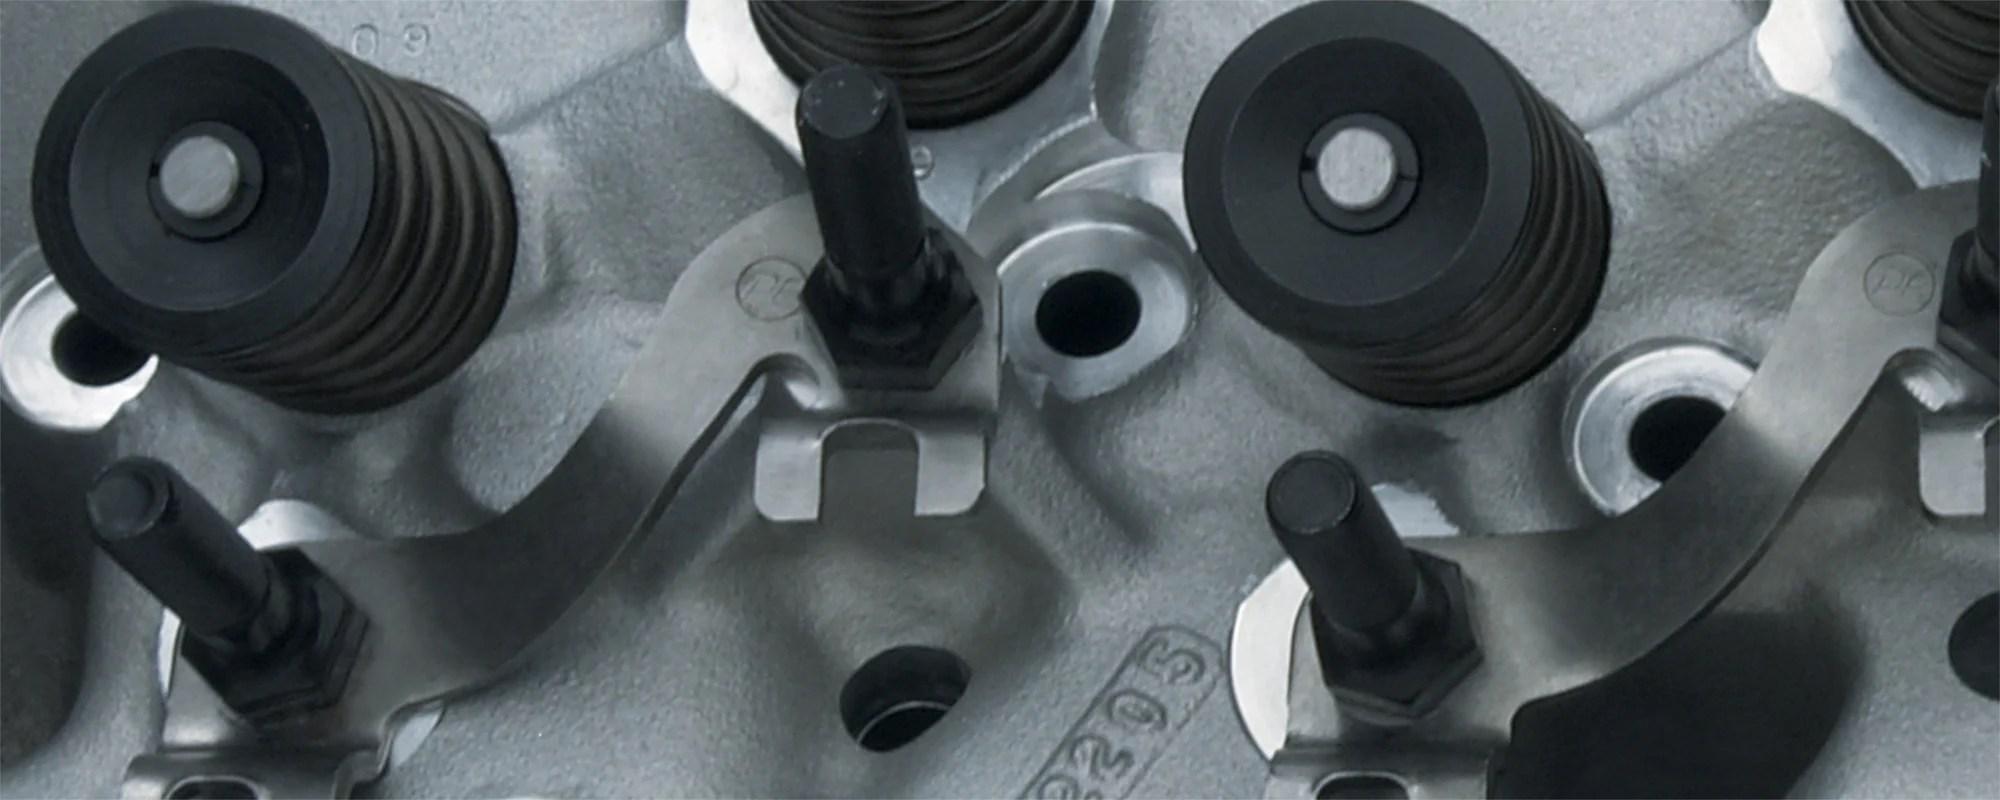 medium resolution of wrg 9599 7 4 454 chevy motorhome wiring diagram chevy 454 engine parts diagram 1989